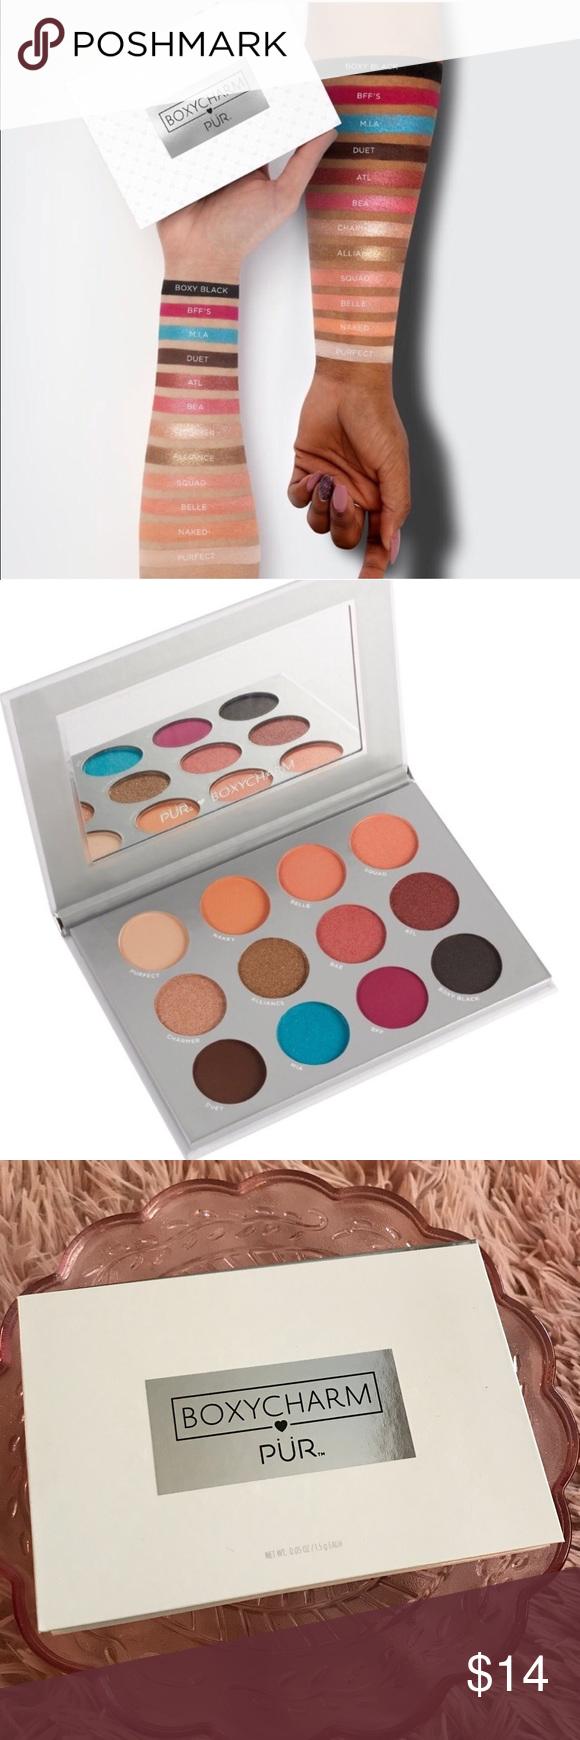 NWB Boxycharm Pur cosmetics new eyeshadow palette NWT